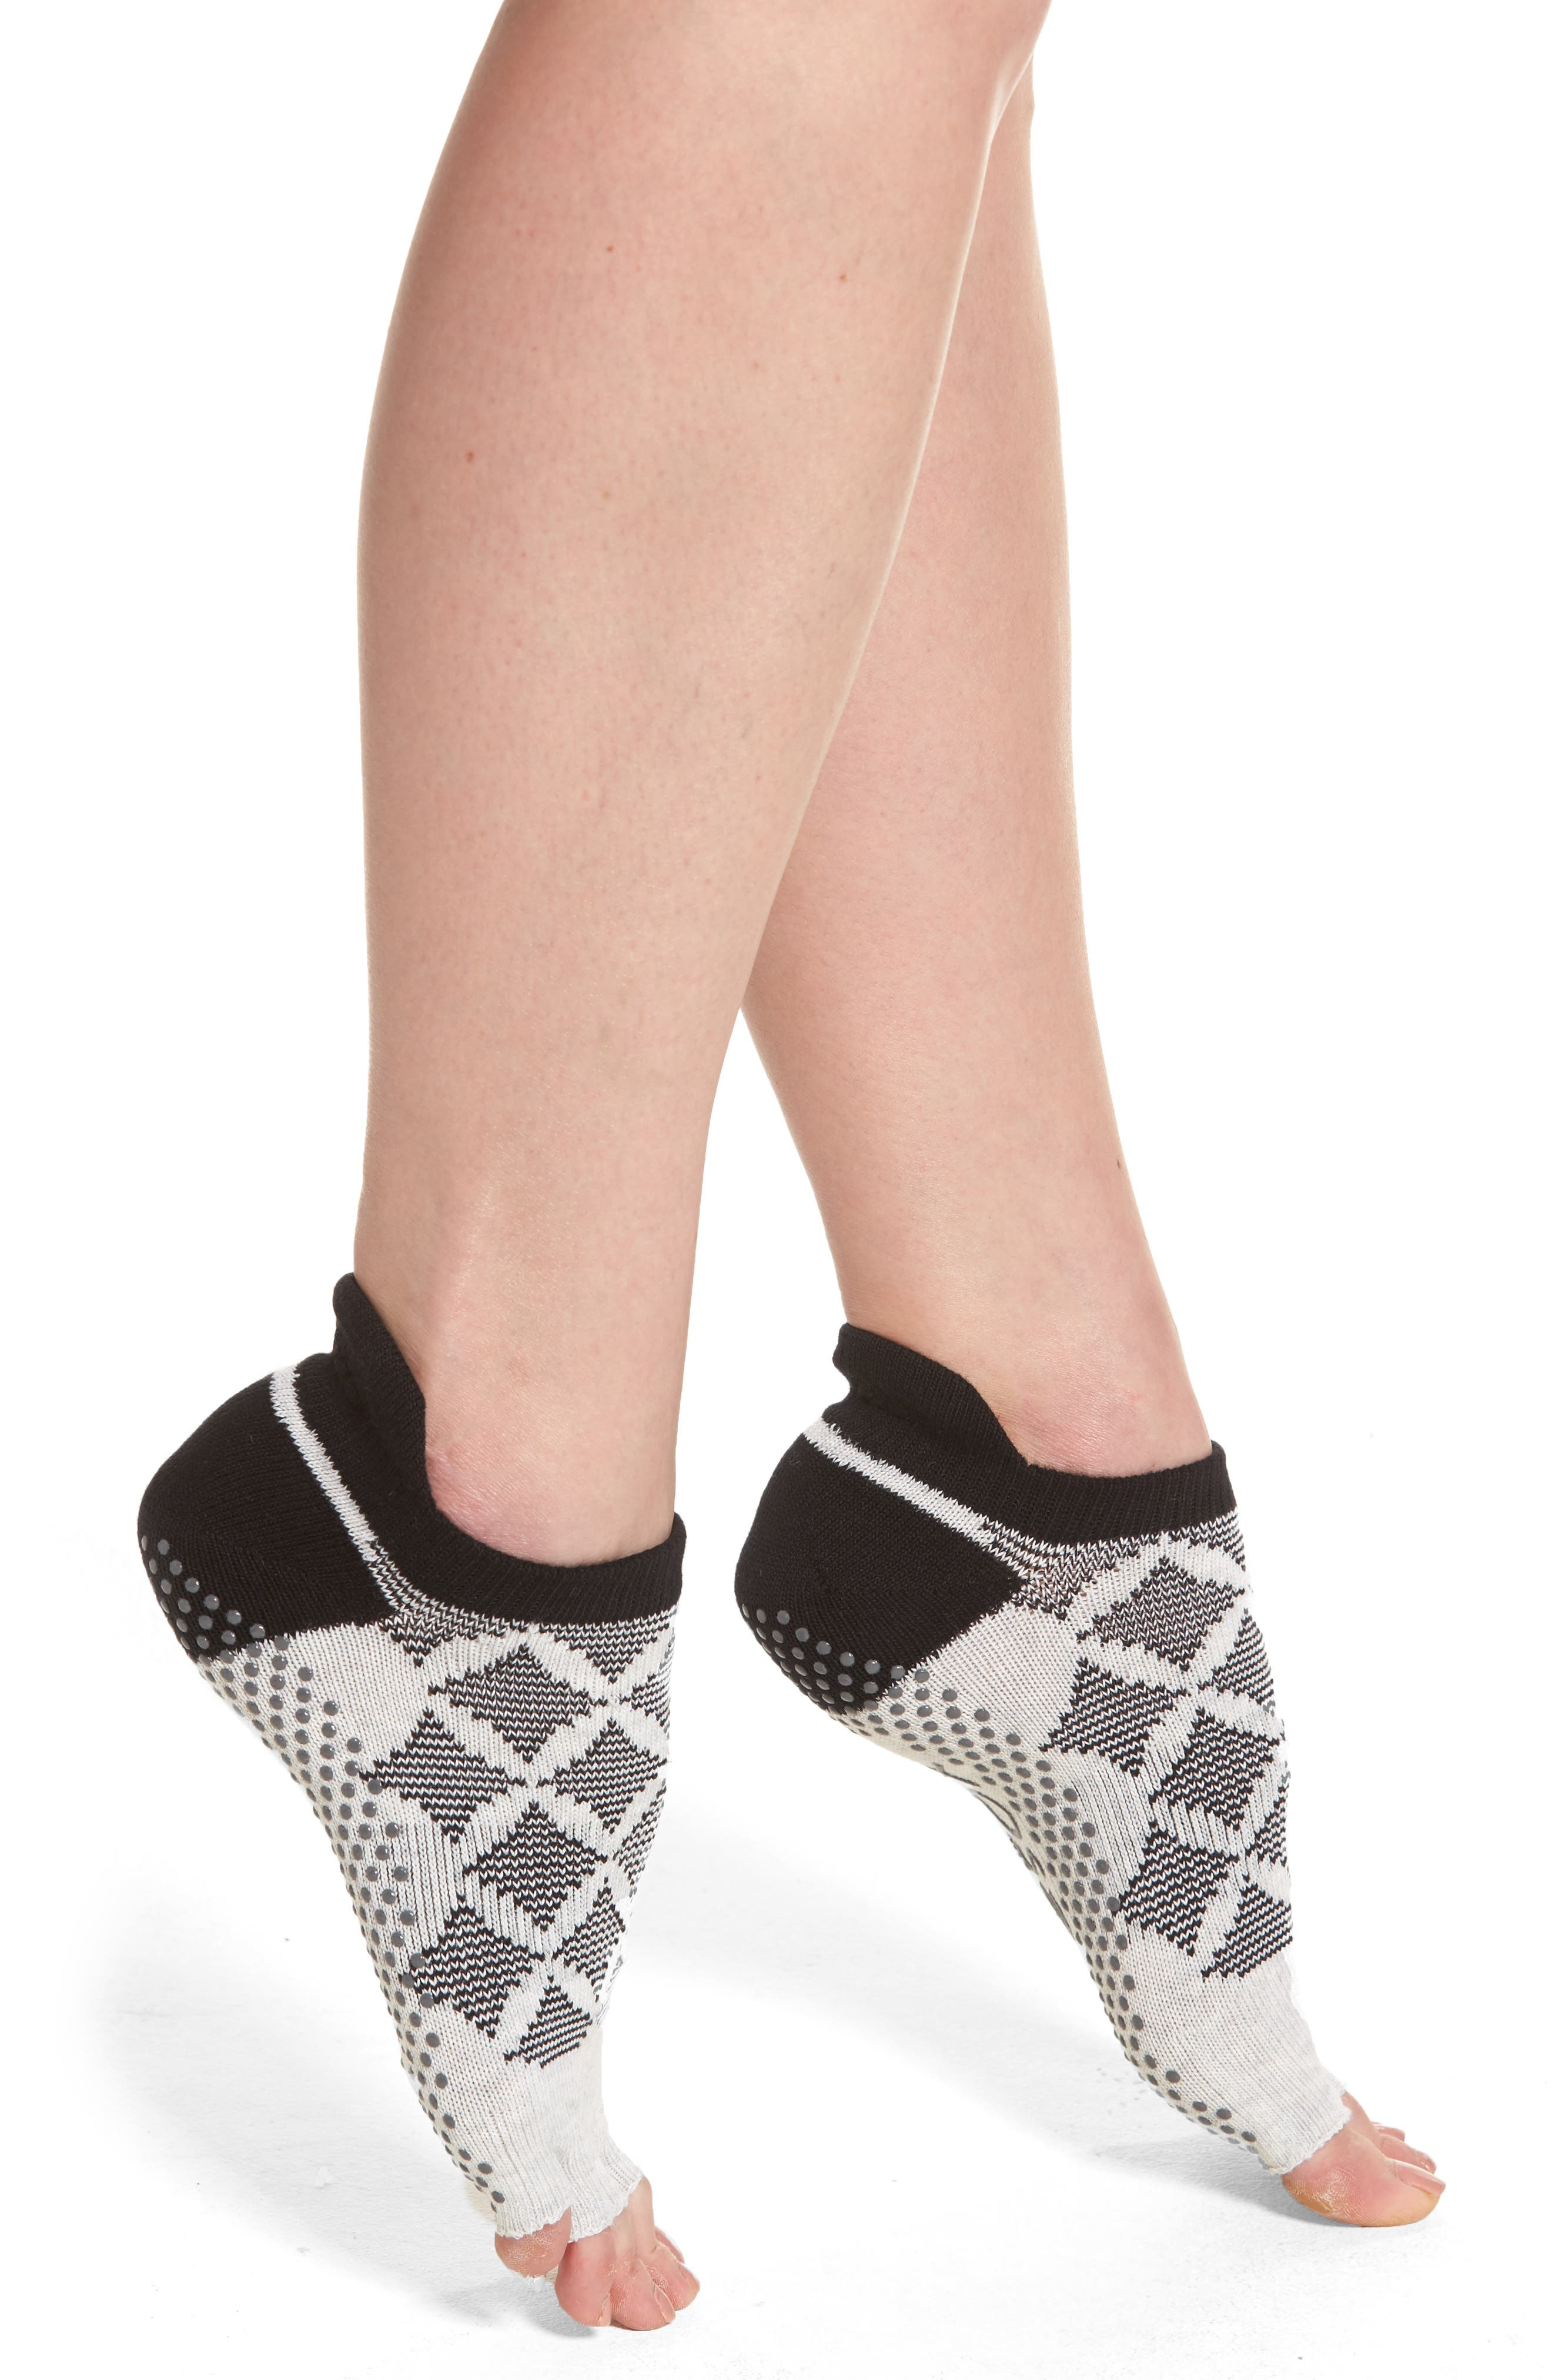 ToeSox Low Rise Half Toe Gripper Socks